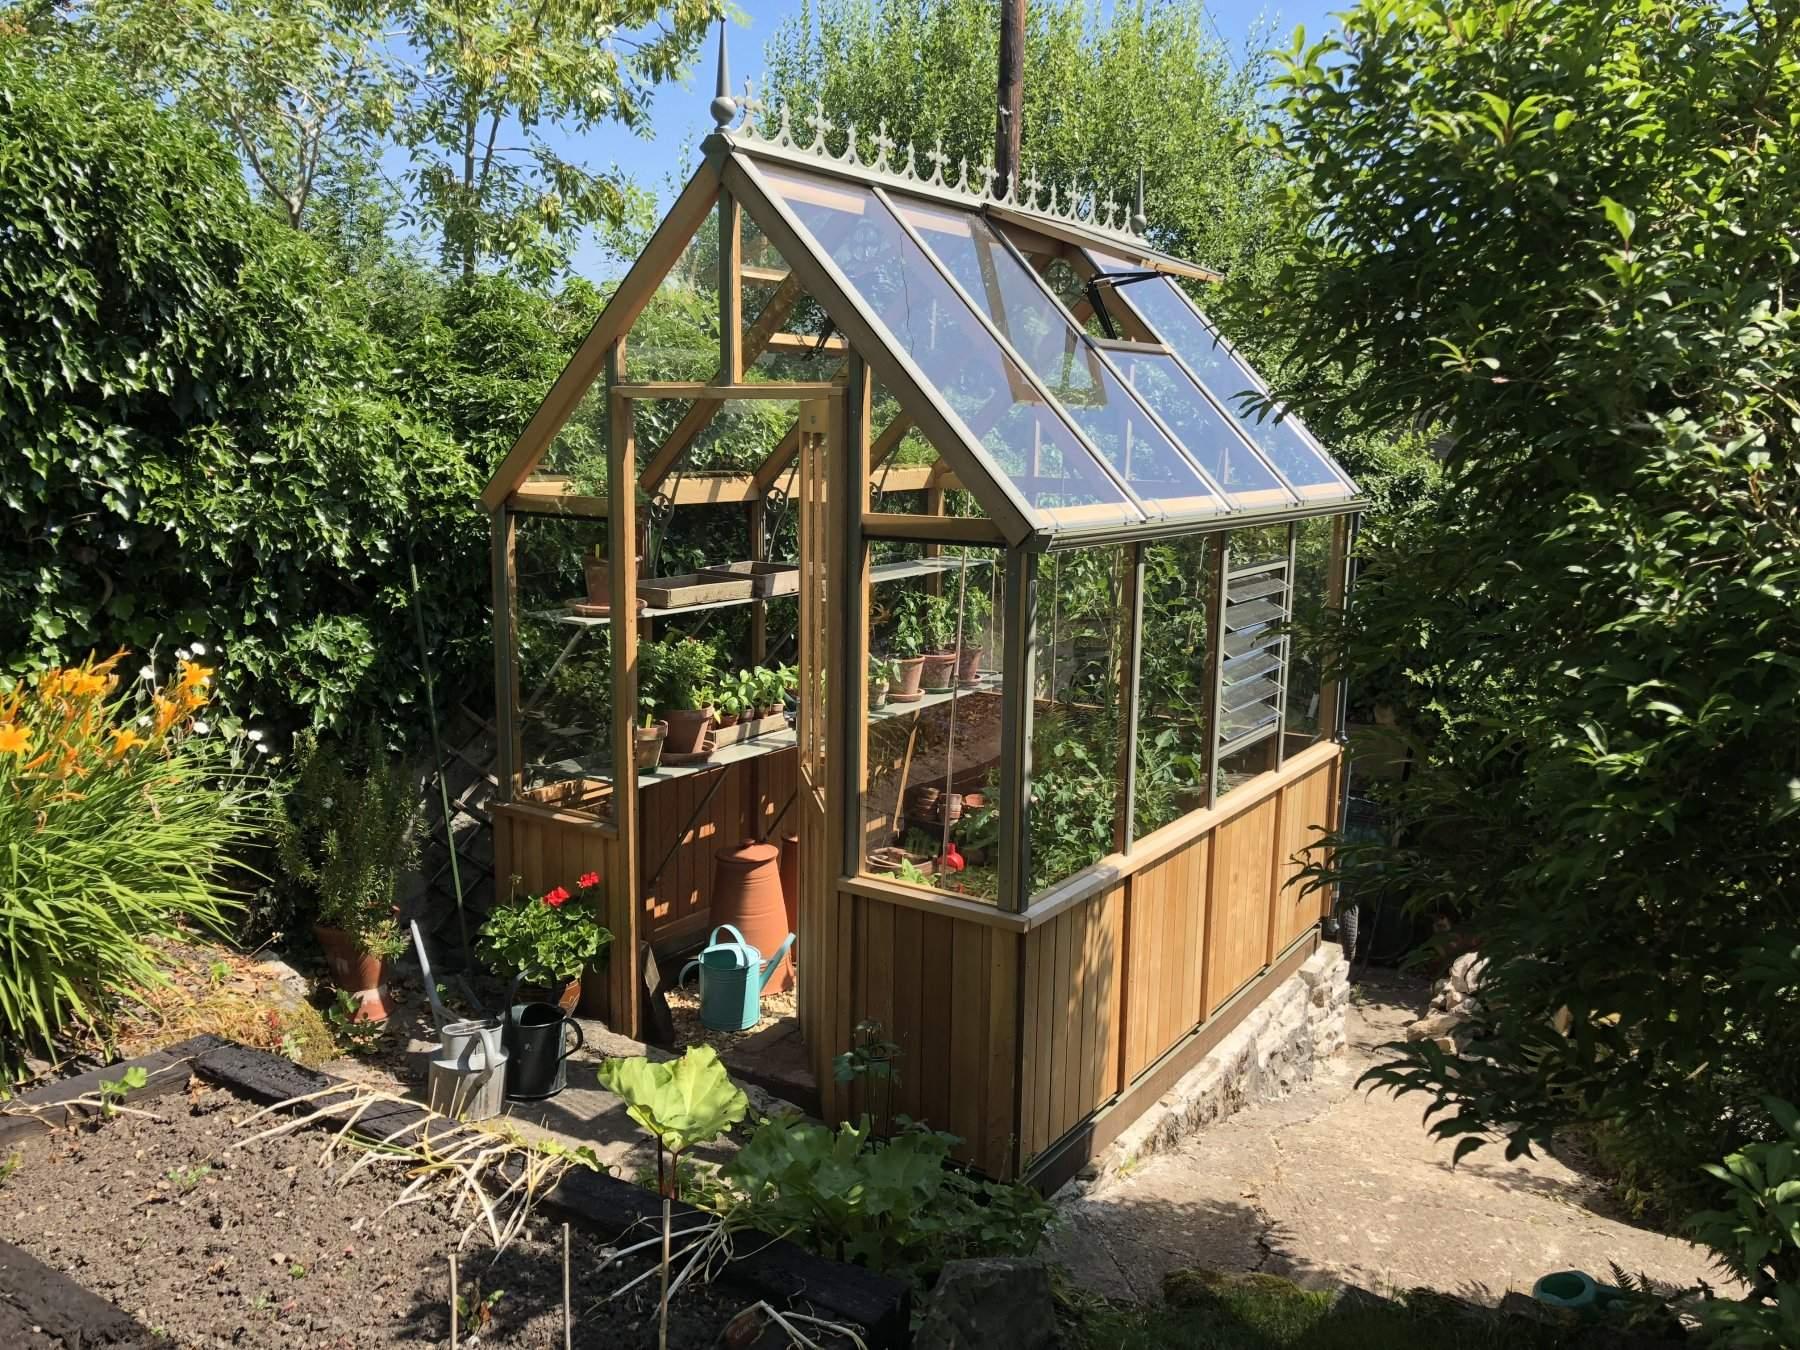 Alton Denston Evolution Victorian Cedar Wood Greenhouse 6ft Wide 8ft Long Backyard greenhouse brown county